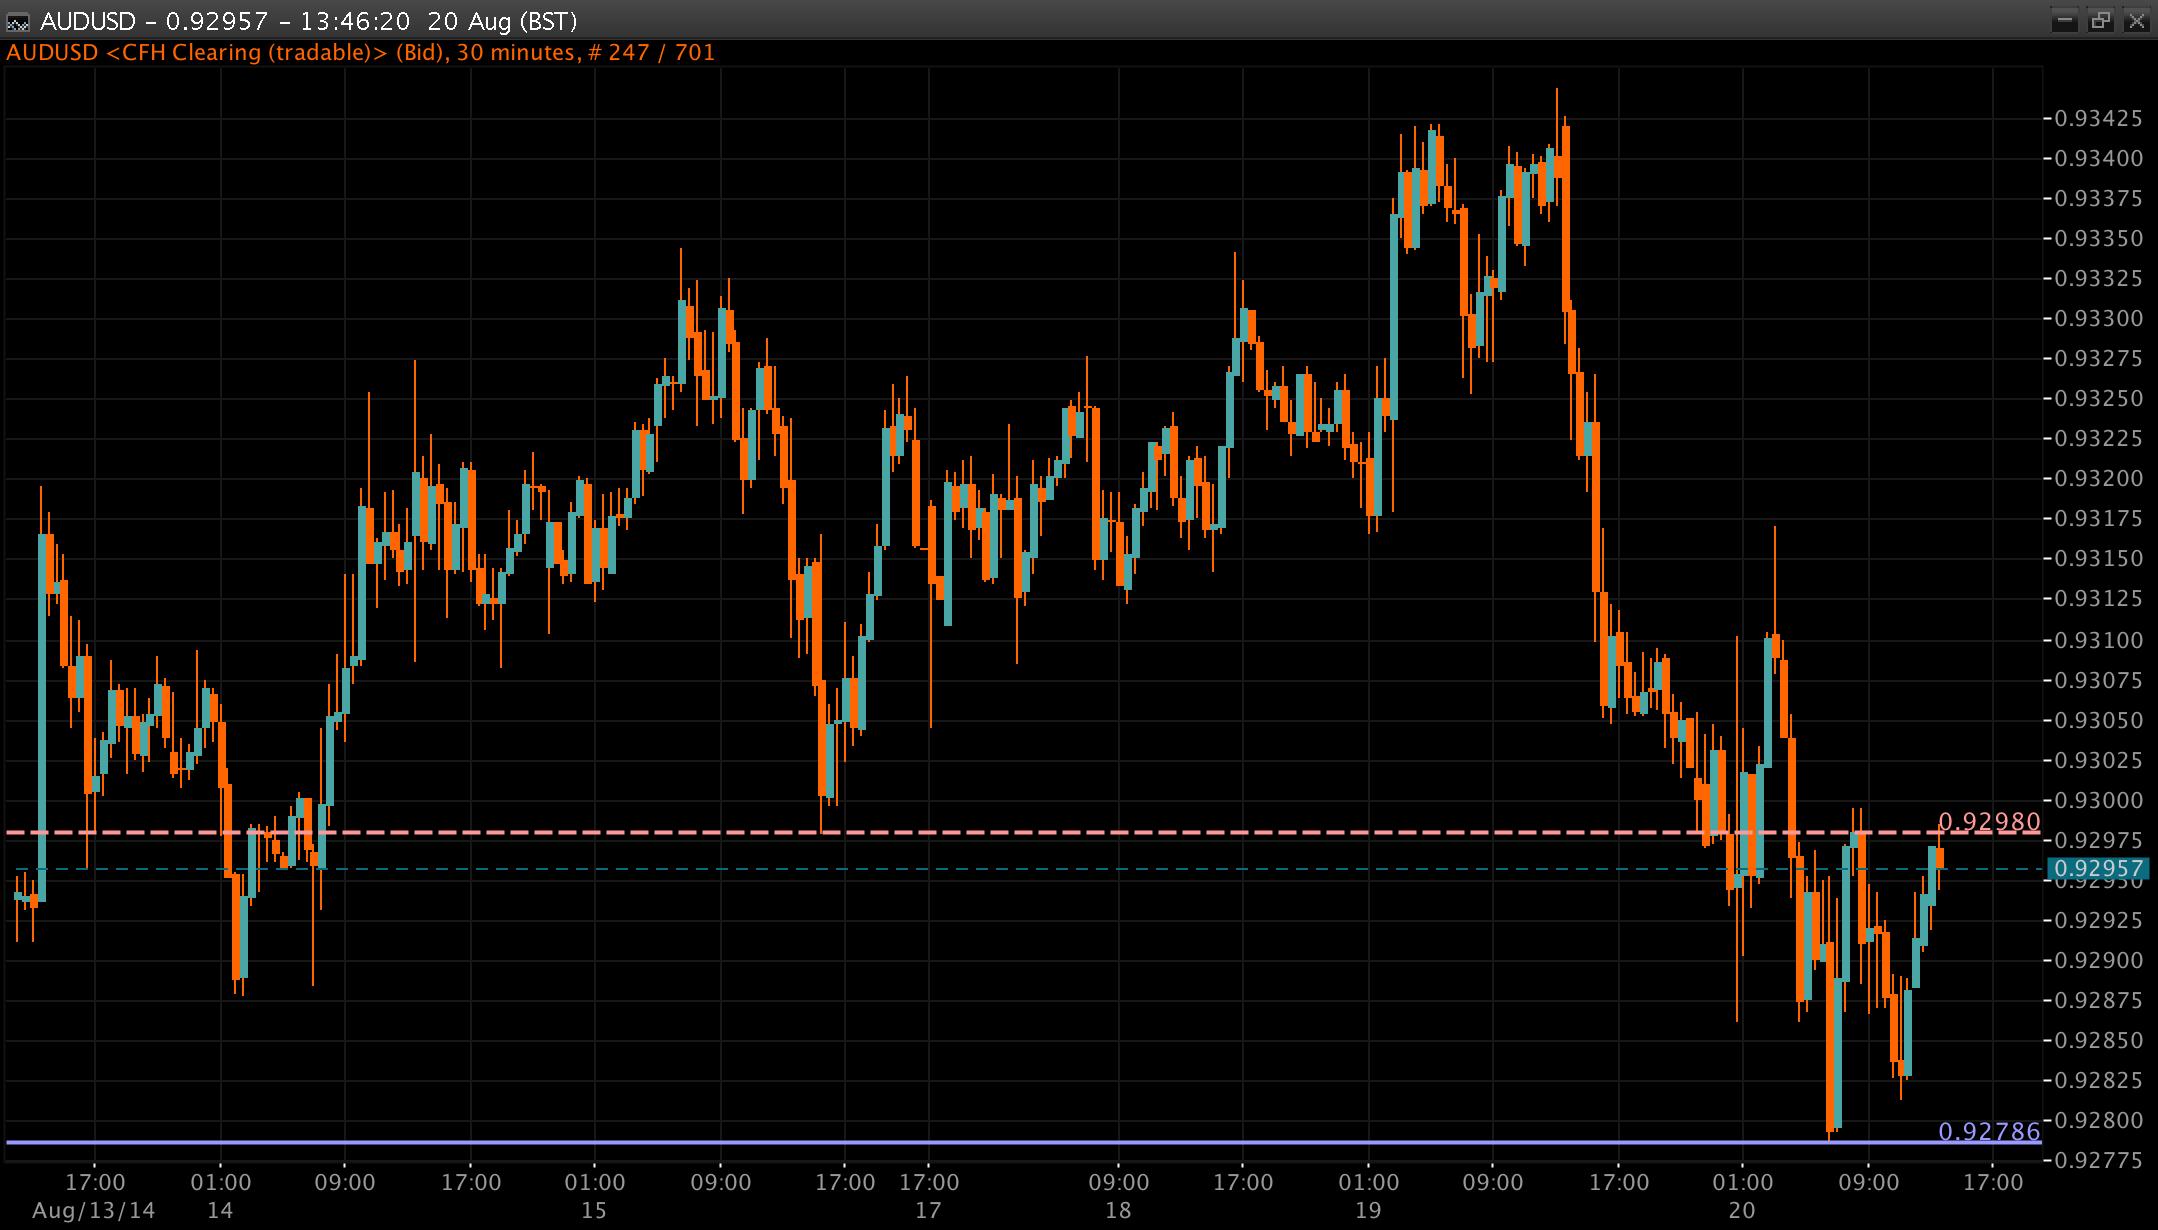 AUD/USD Chart 20 Aug 2014